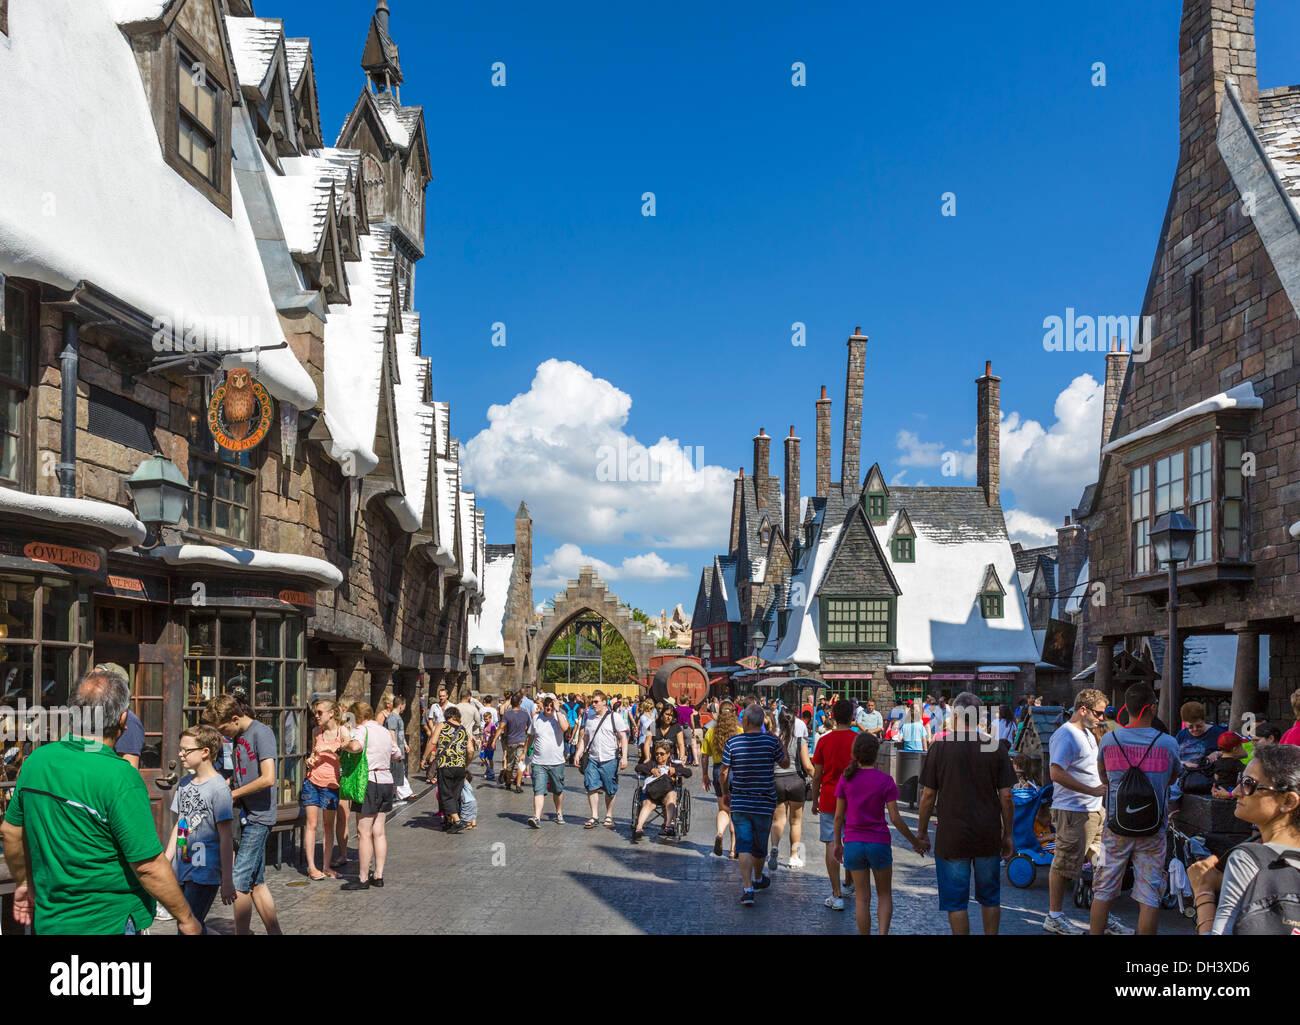 Hogsmeade in the Wizarding World of Harry Potter, Islands of Adventure, Universal Orlando Resort, Orlando, Central Florida, USA - Stock Image